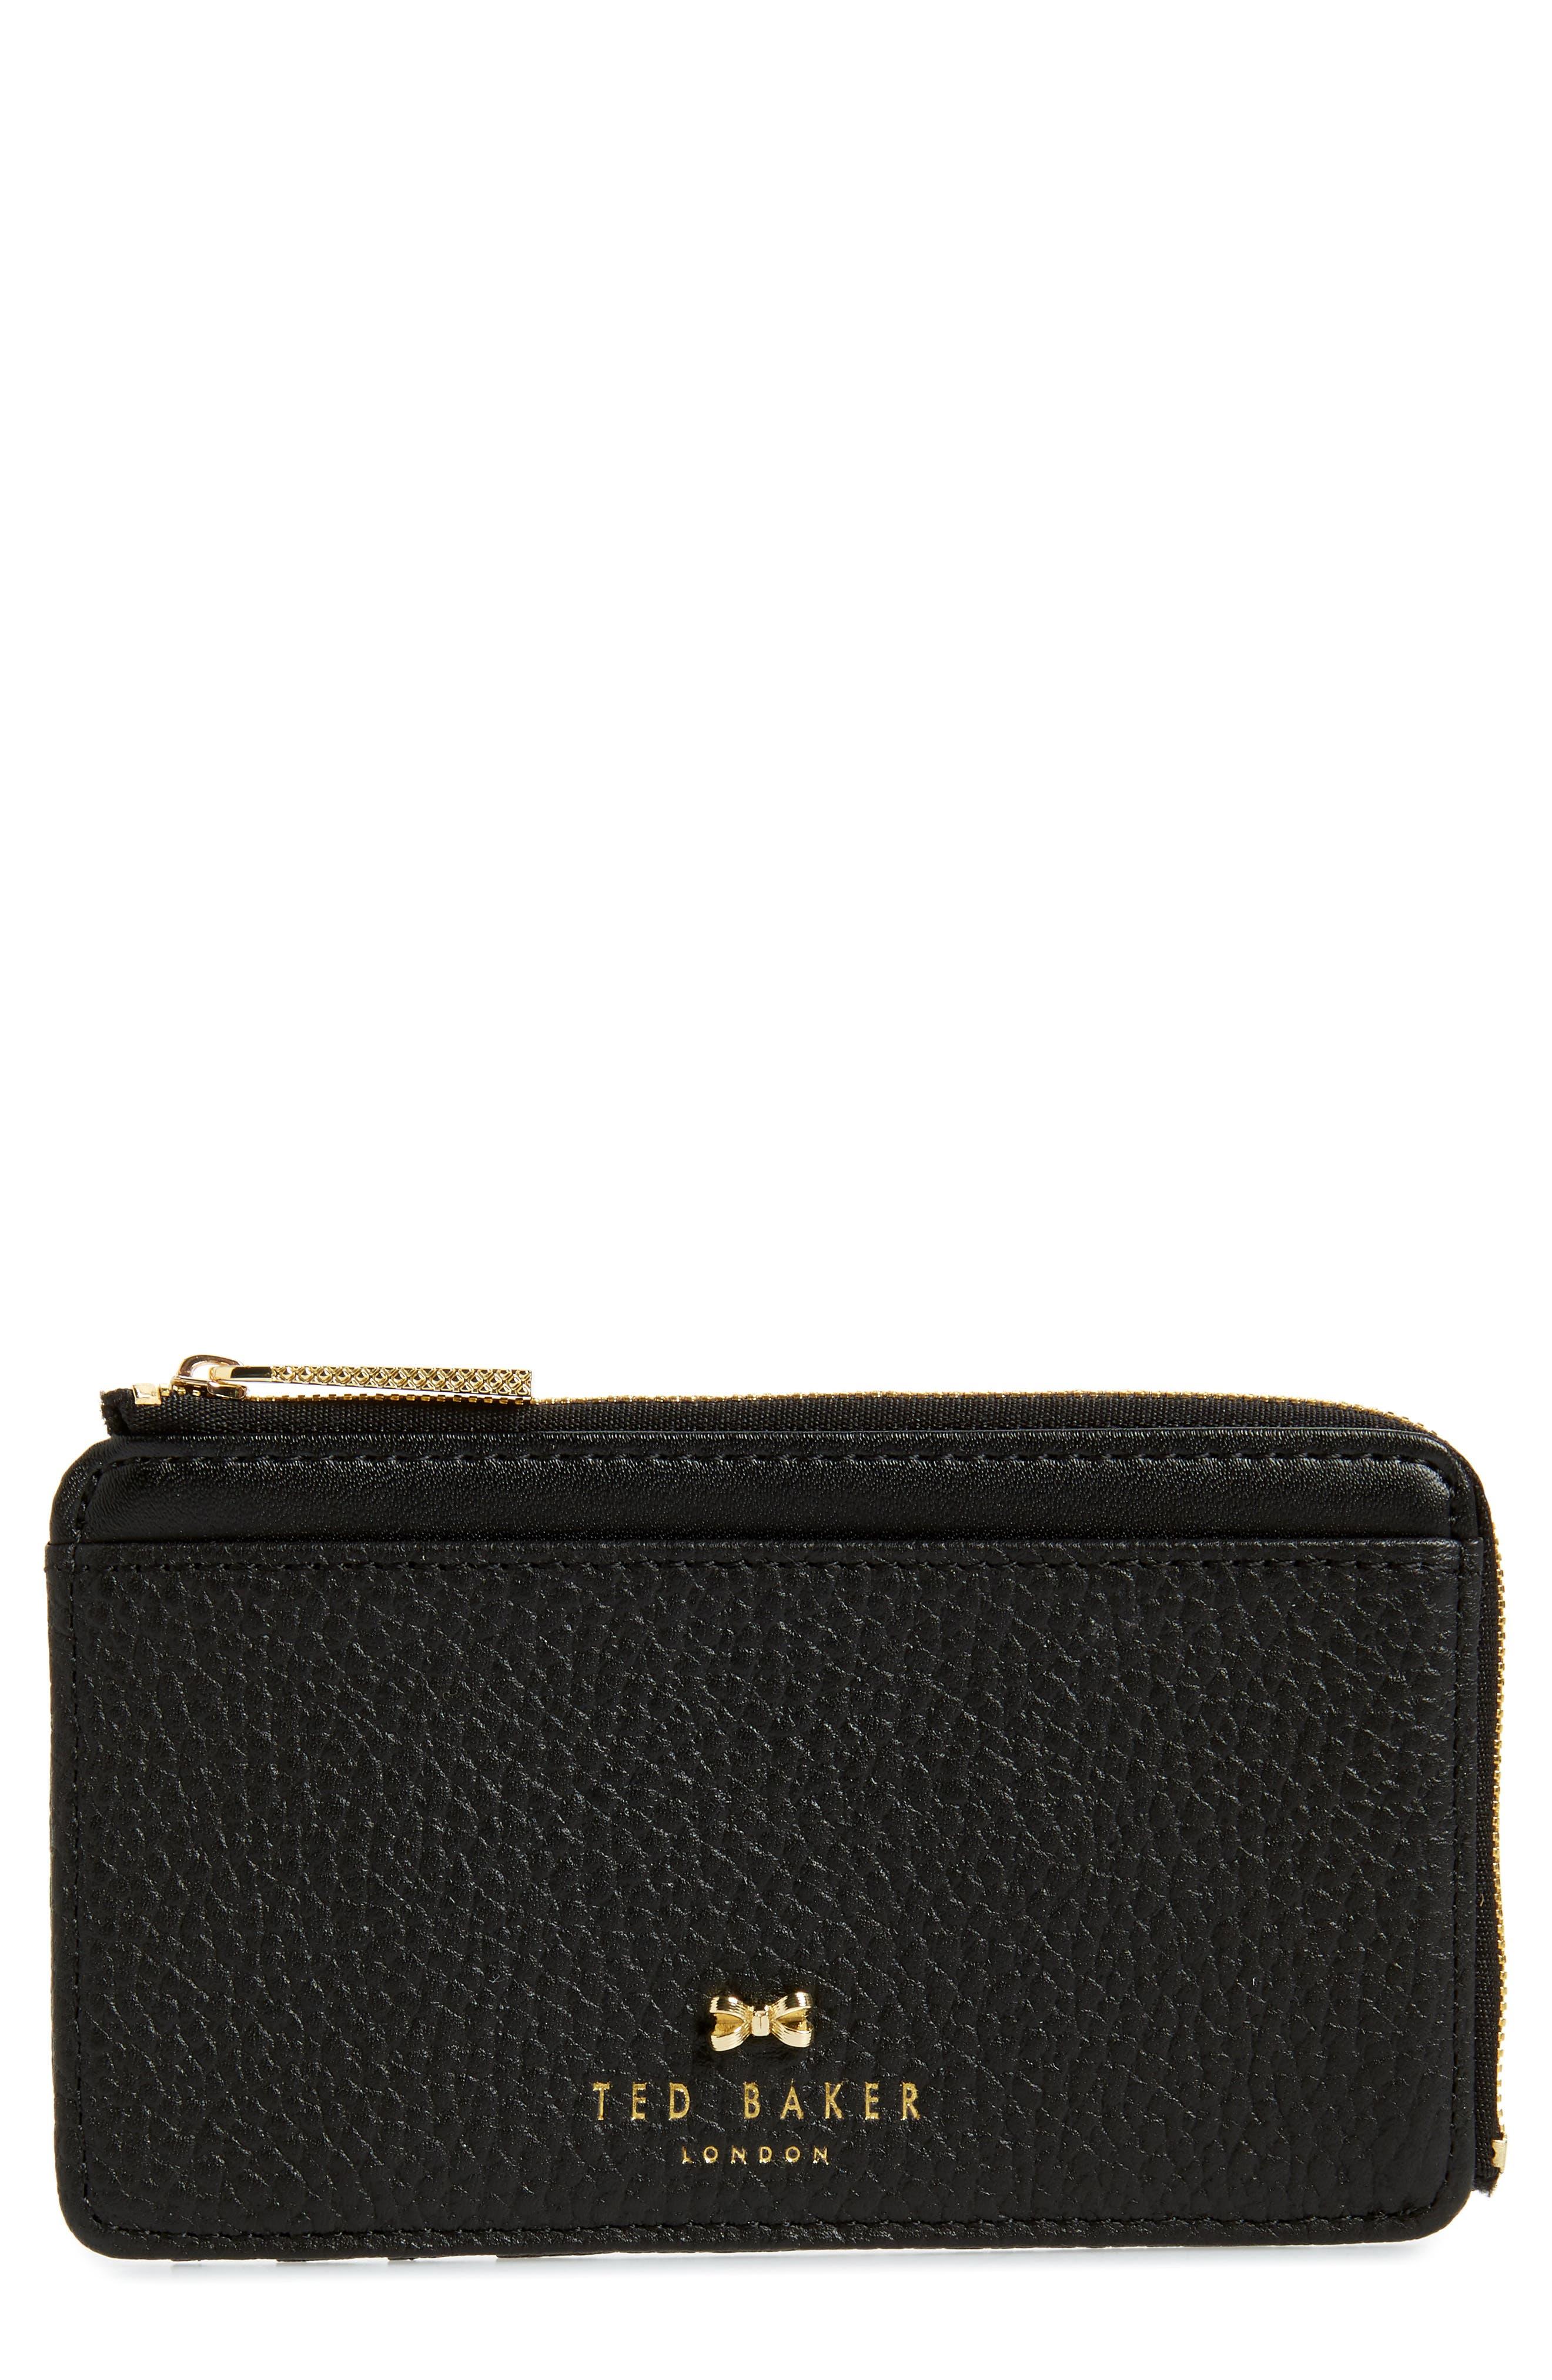 Lotta Bow Leather Card Case, Main, color, 001